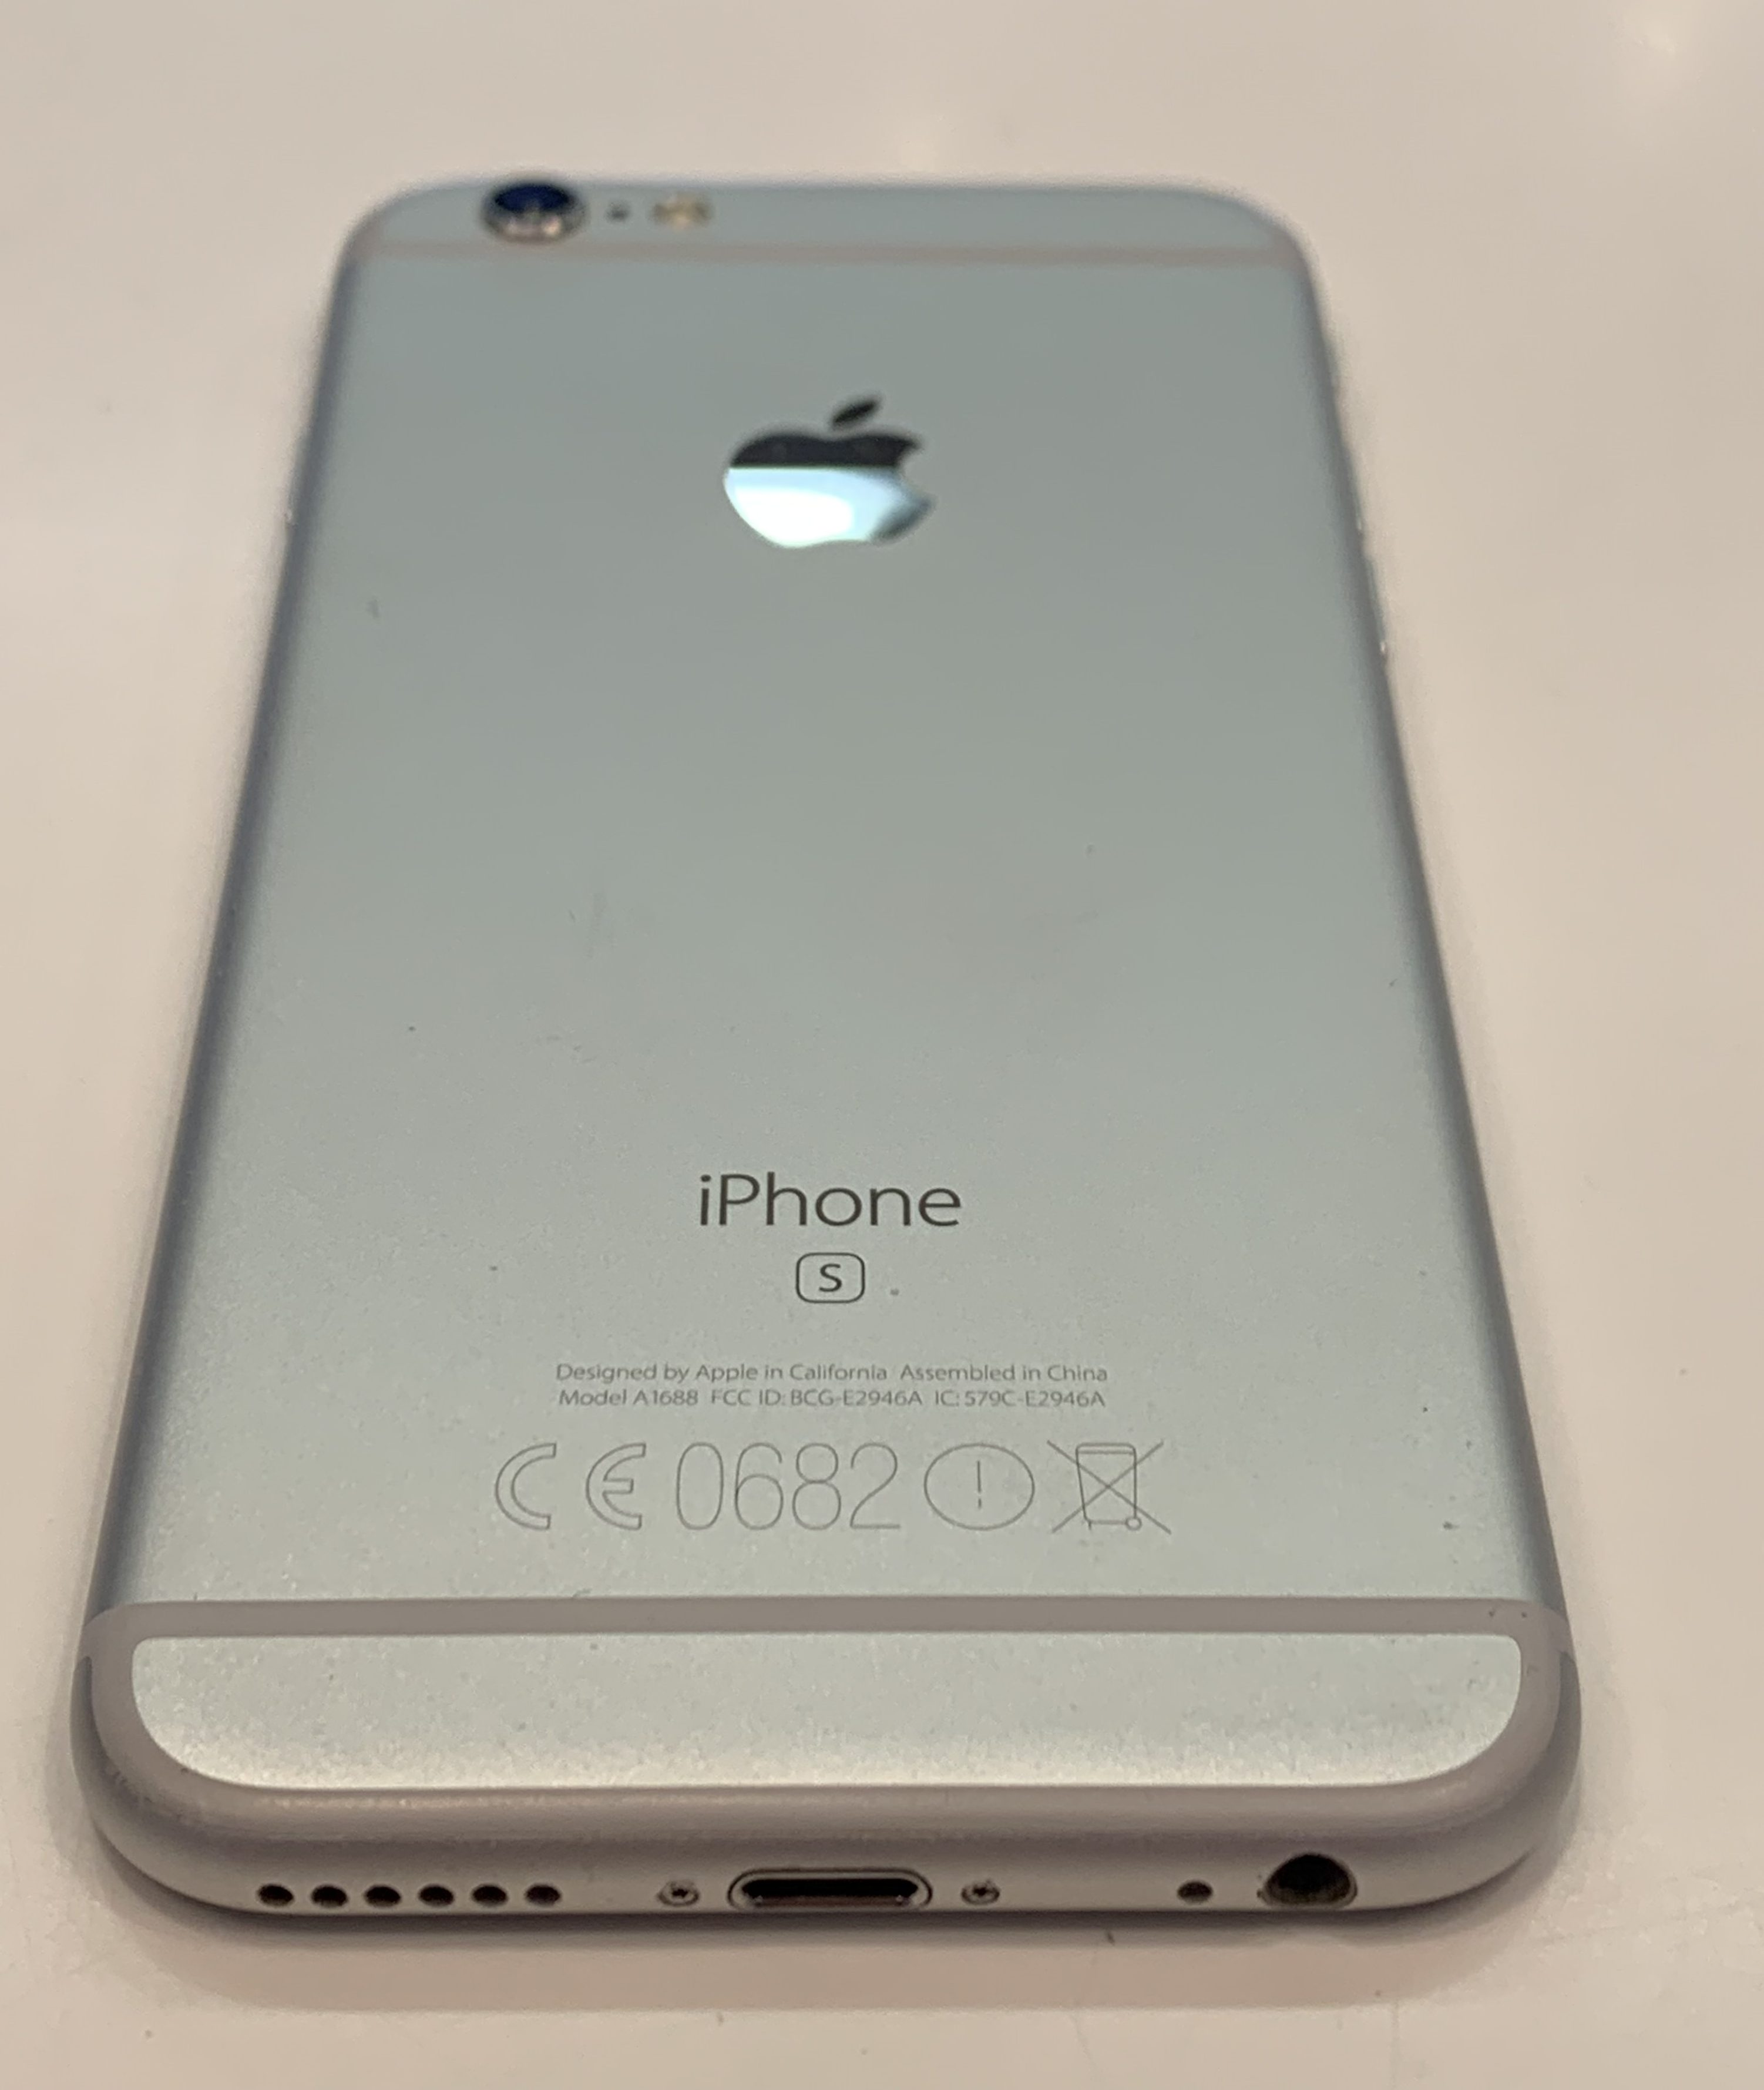 iPhone 6S 16GB, 16 GB, Silver, imagen 2